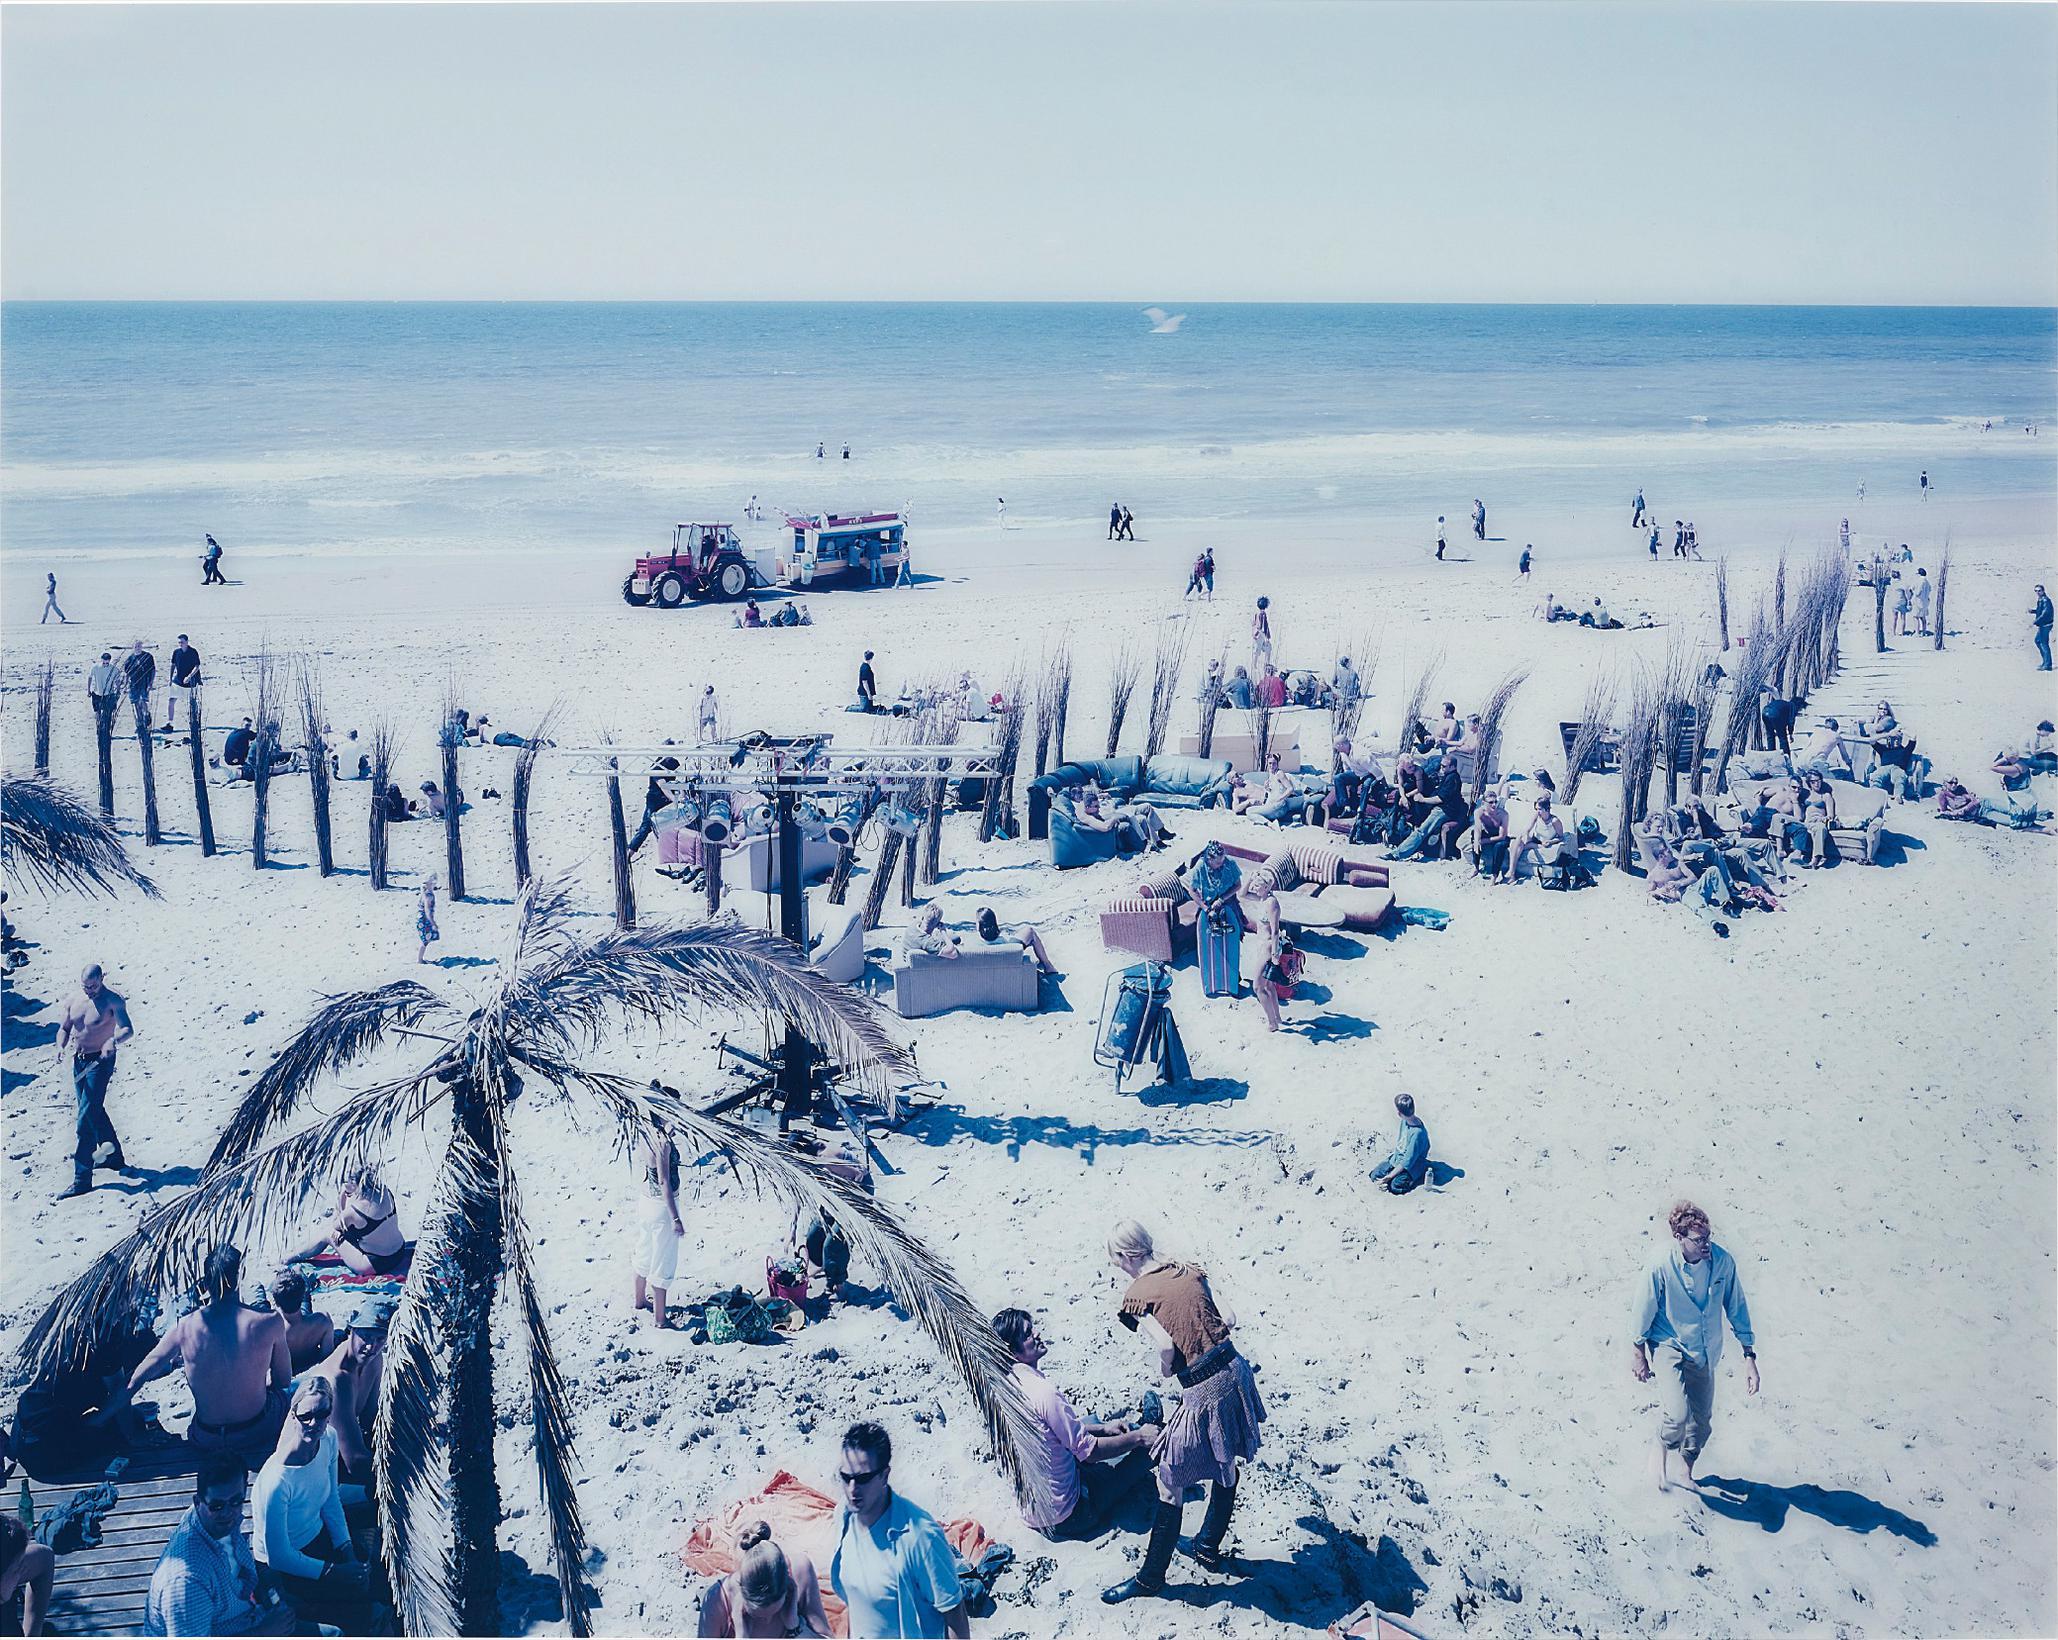 Massimo Vitali-Spiagge Olandesi Bloemendaal-2001